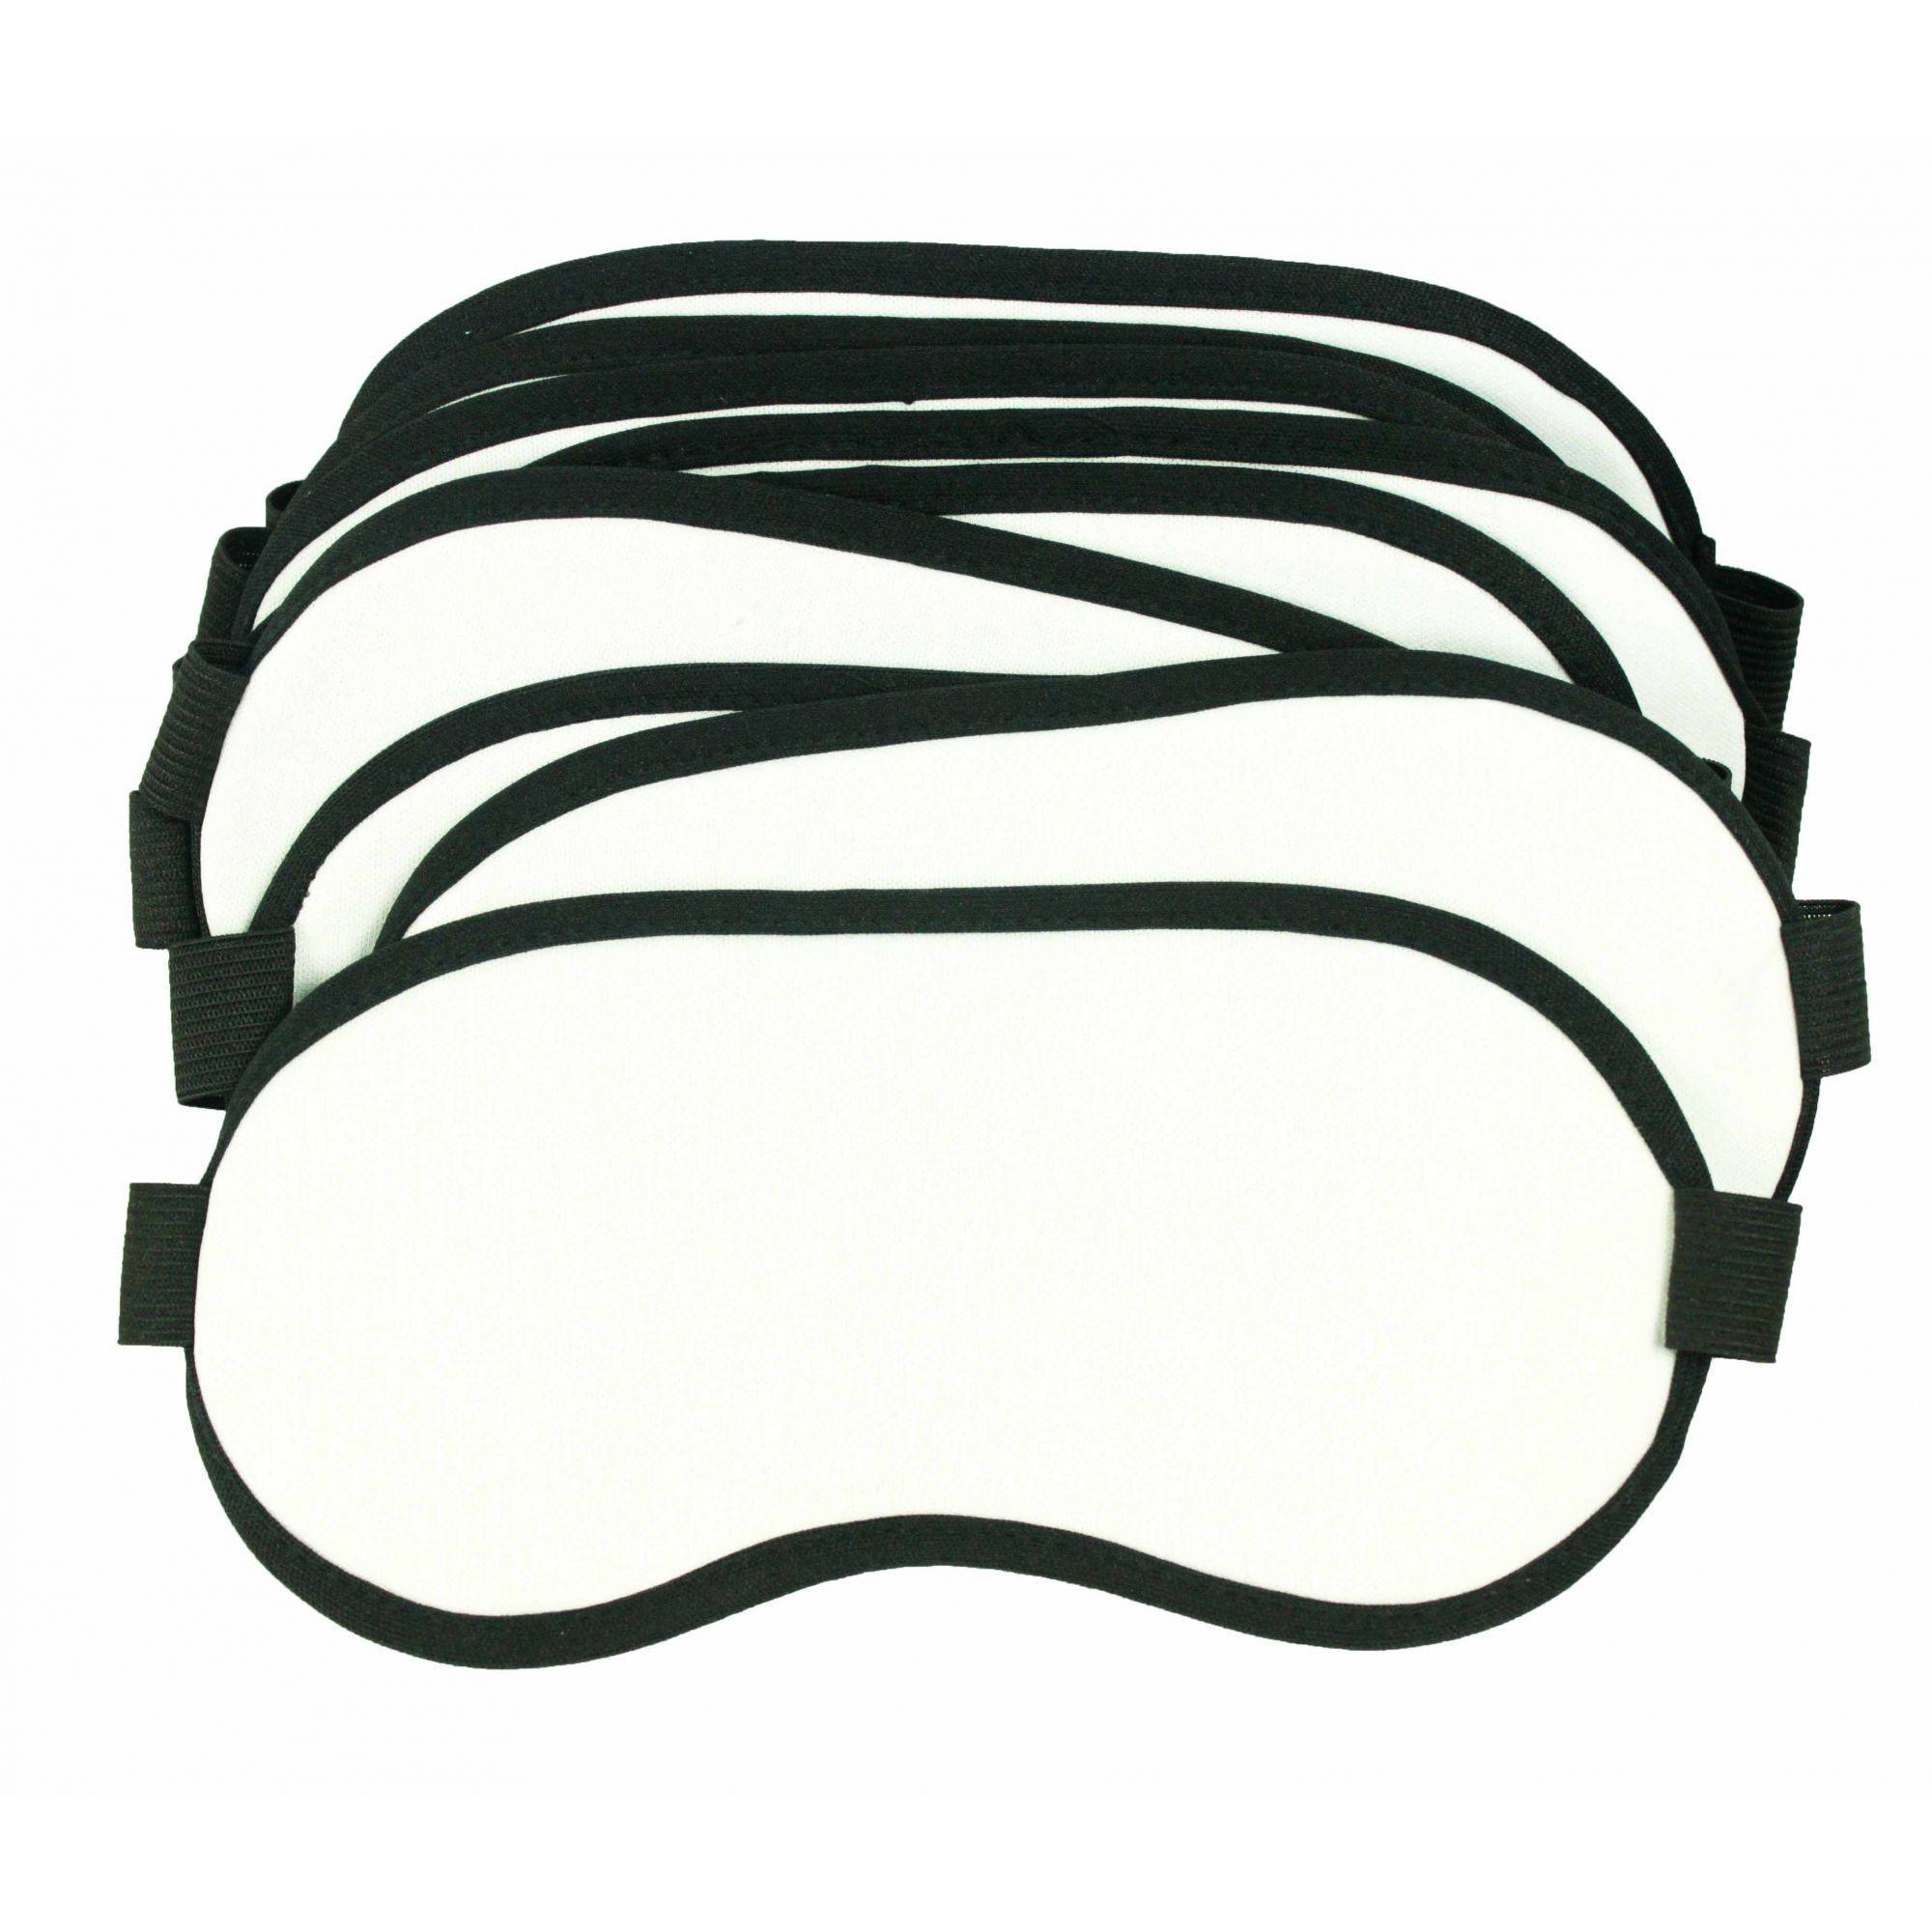 Máscara de Dormir  para sublimação pct 50 unidades